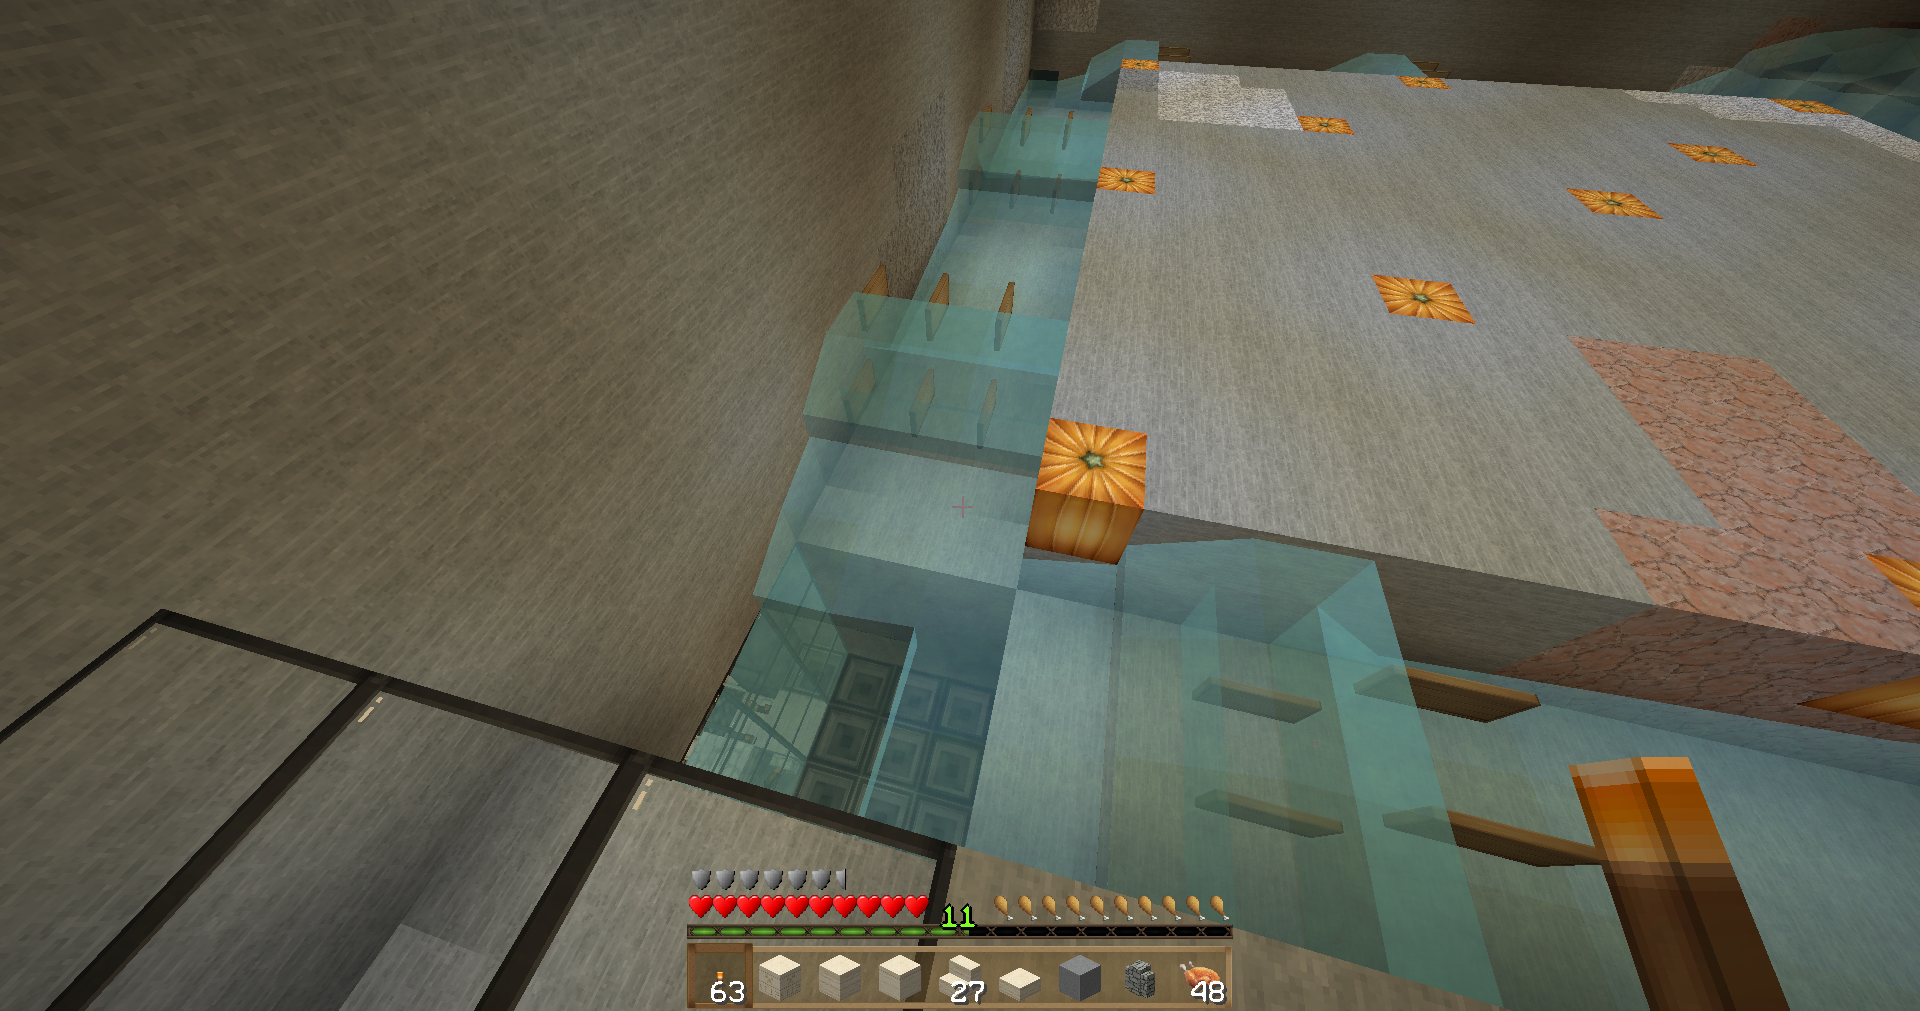 Slime farm error 18 recent updates and snapshots minecraft 2014 09 09003726 ccuart Choice Image